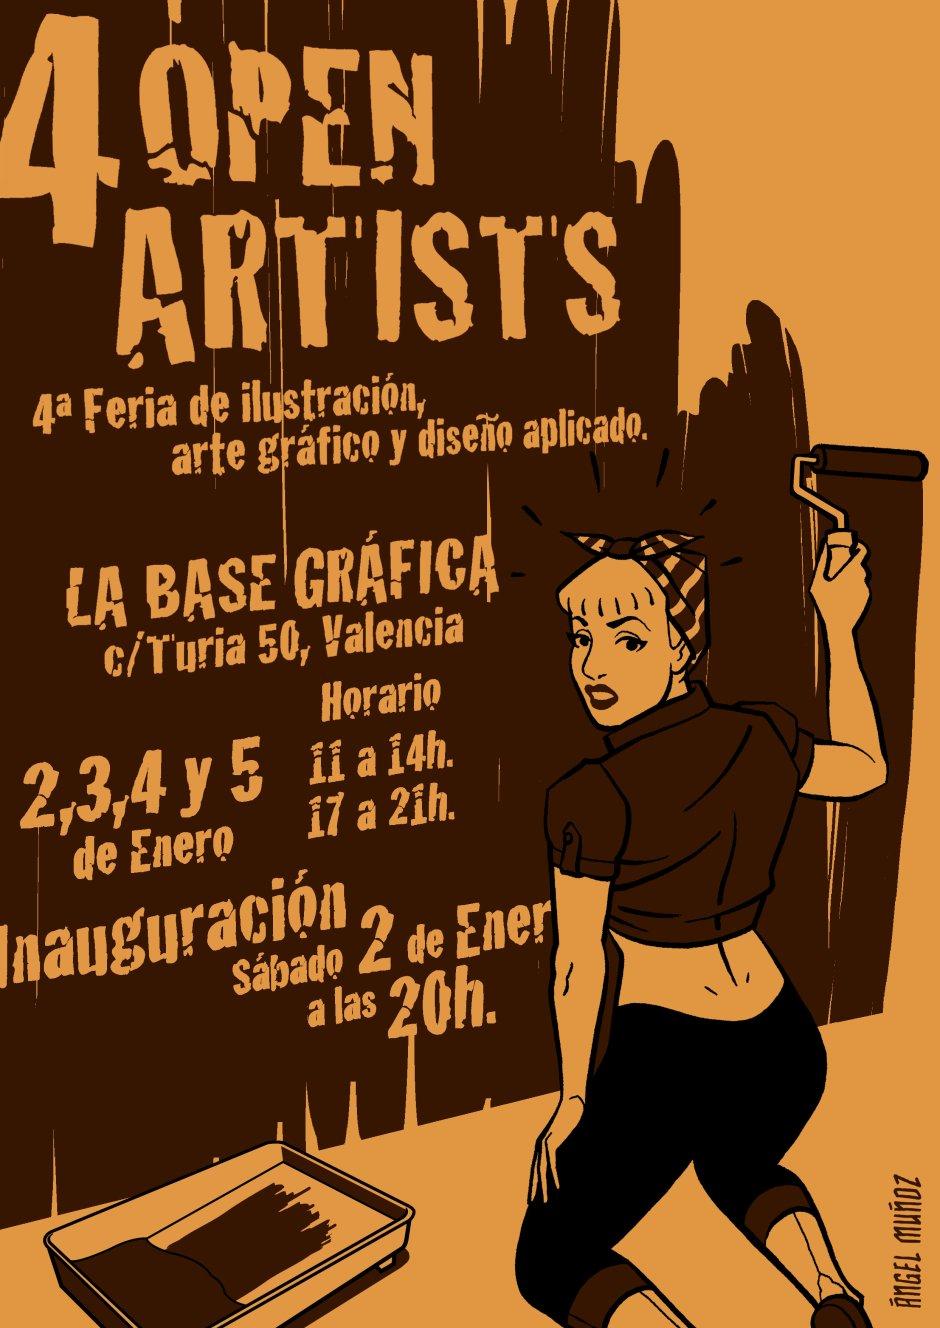 4 open artists (1)